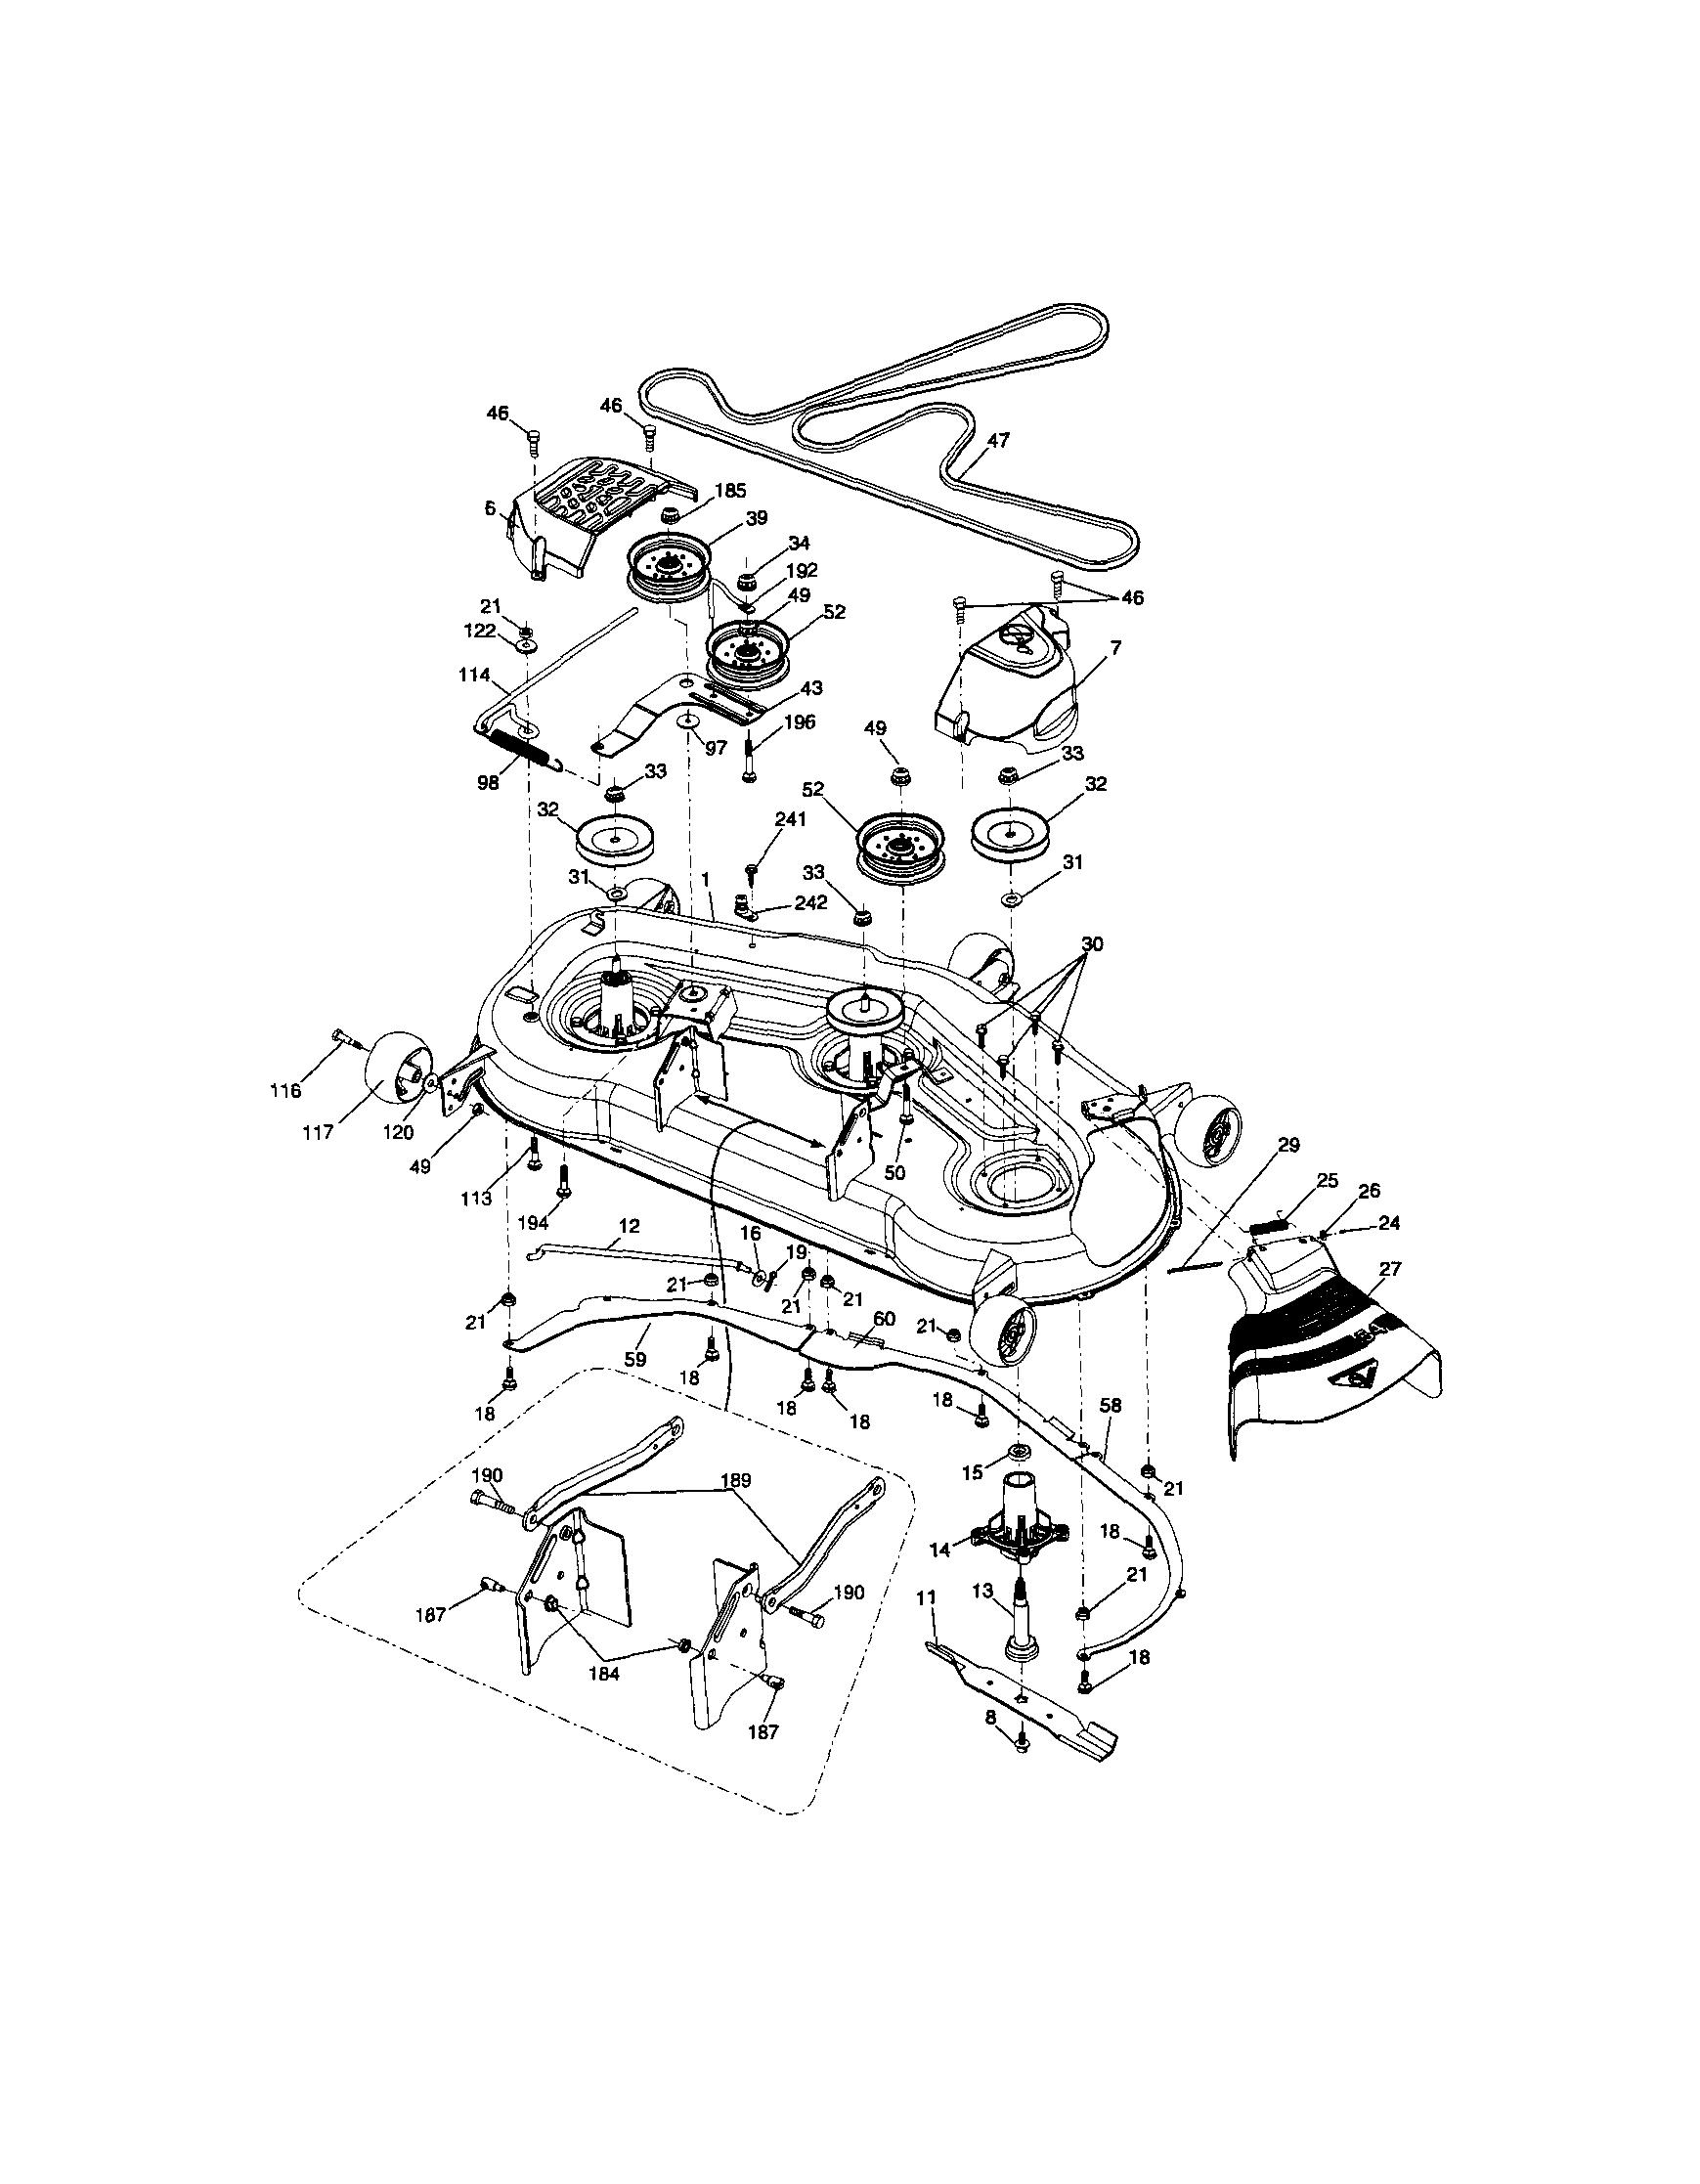 Craftsman Mower Part Riding Lawn Tractor Diagram